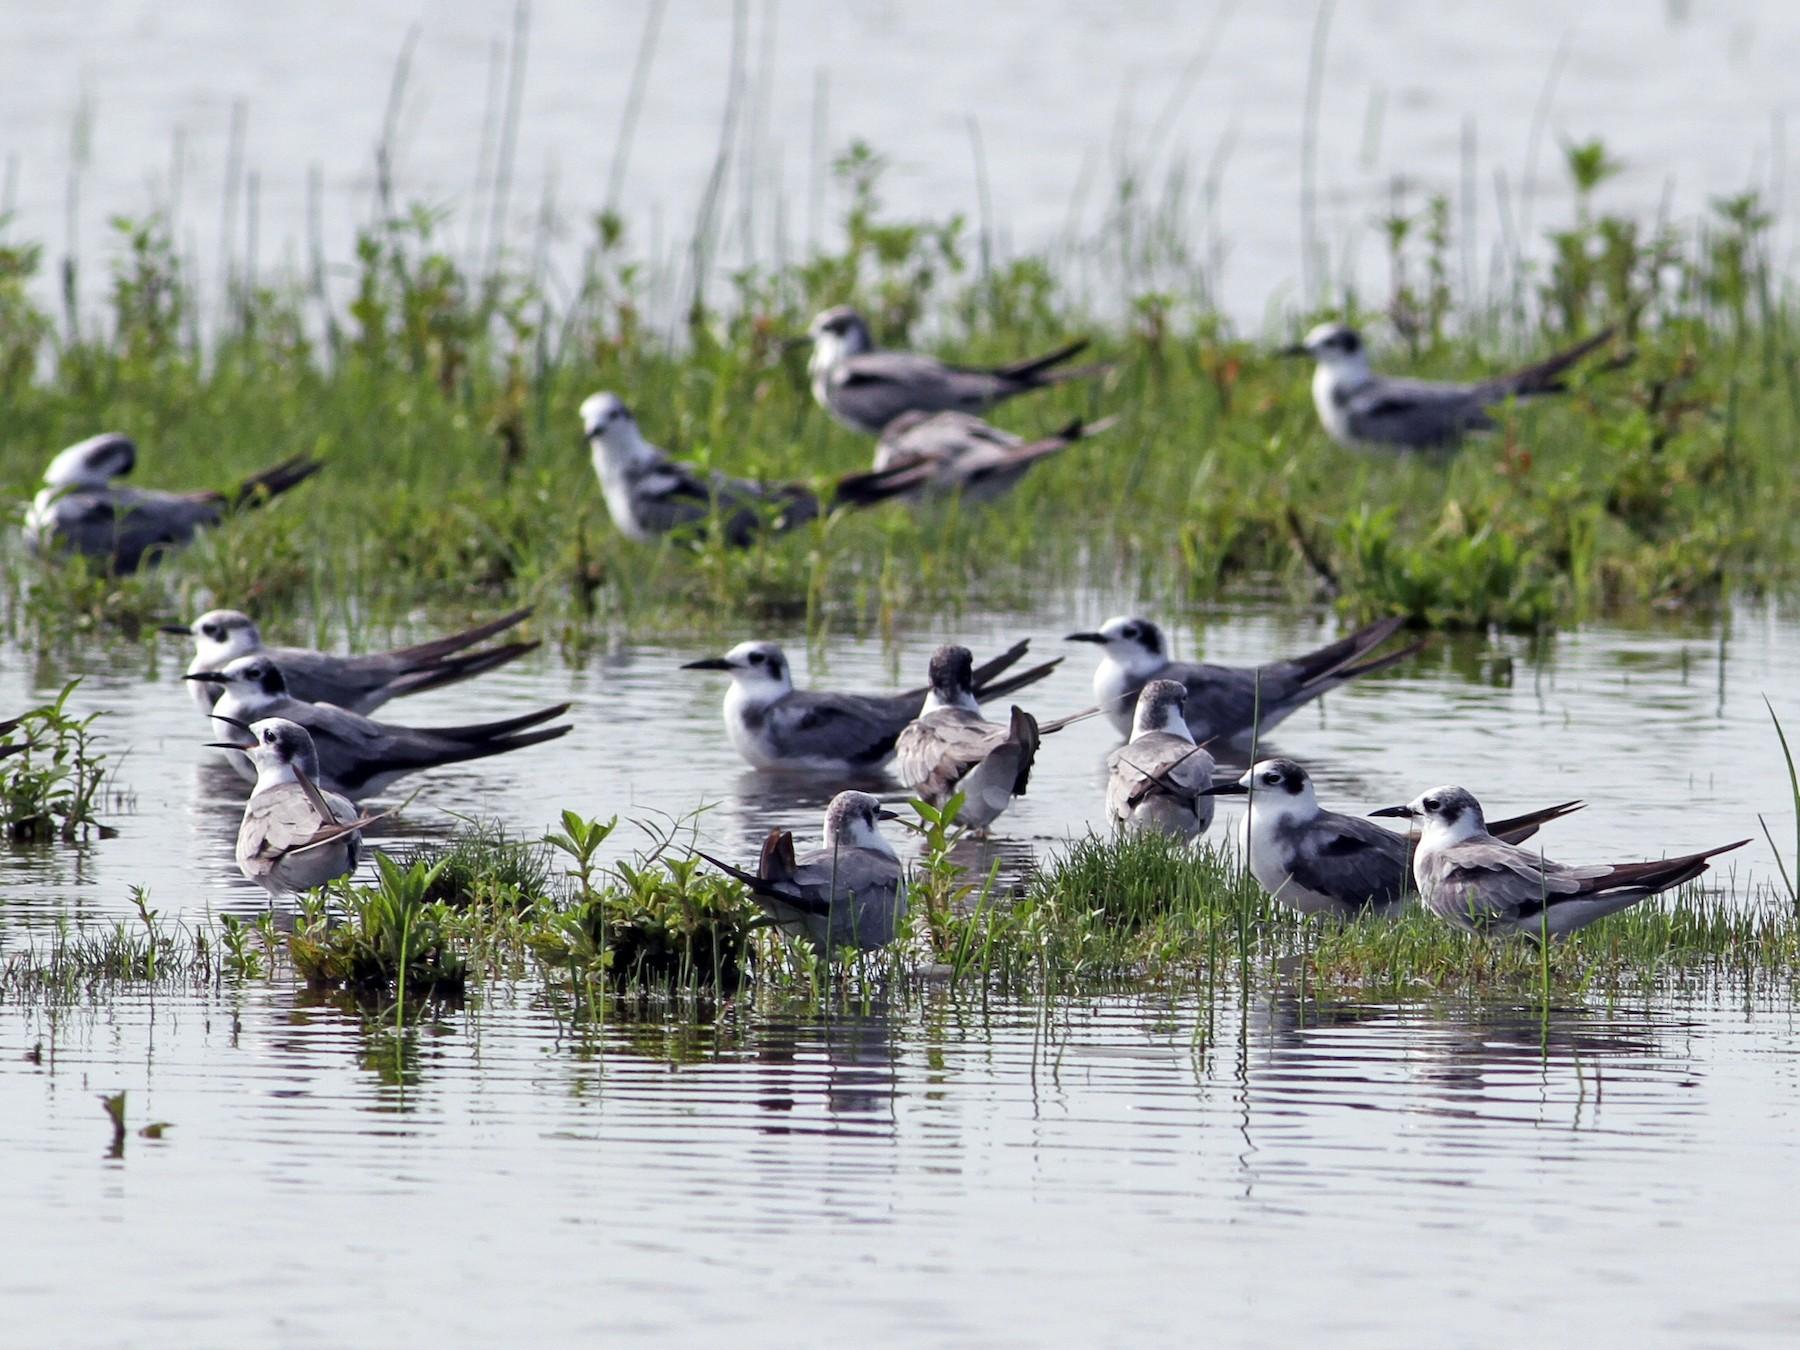 Black Tern - Liliana Chavarria Duriaux